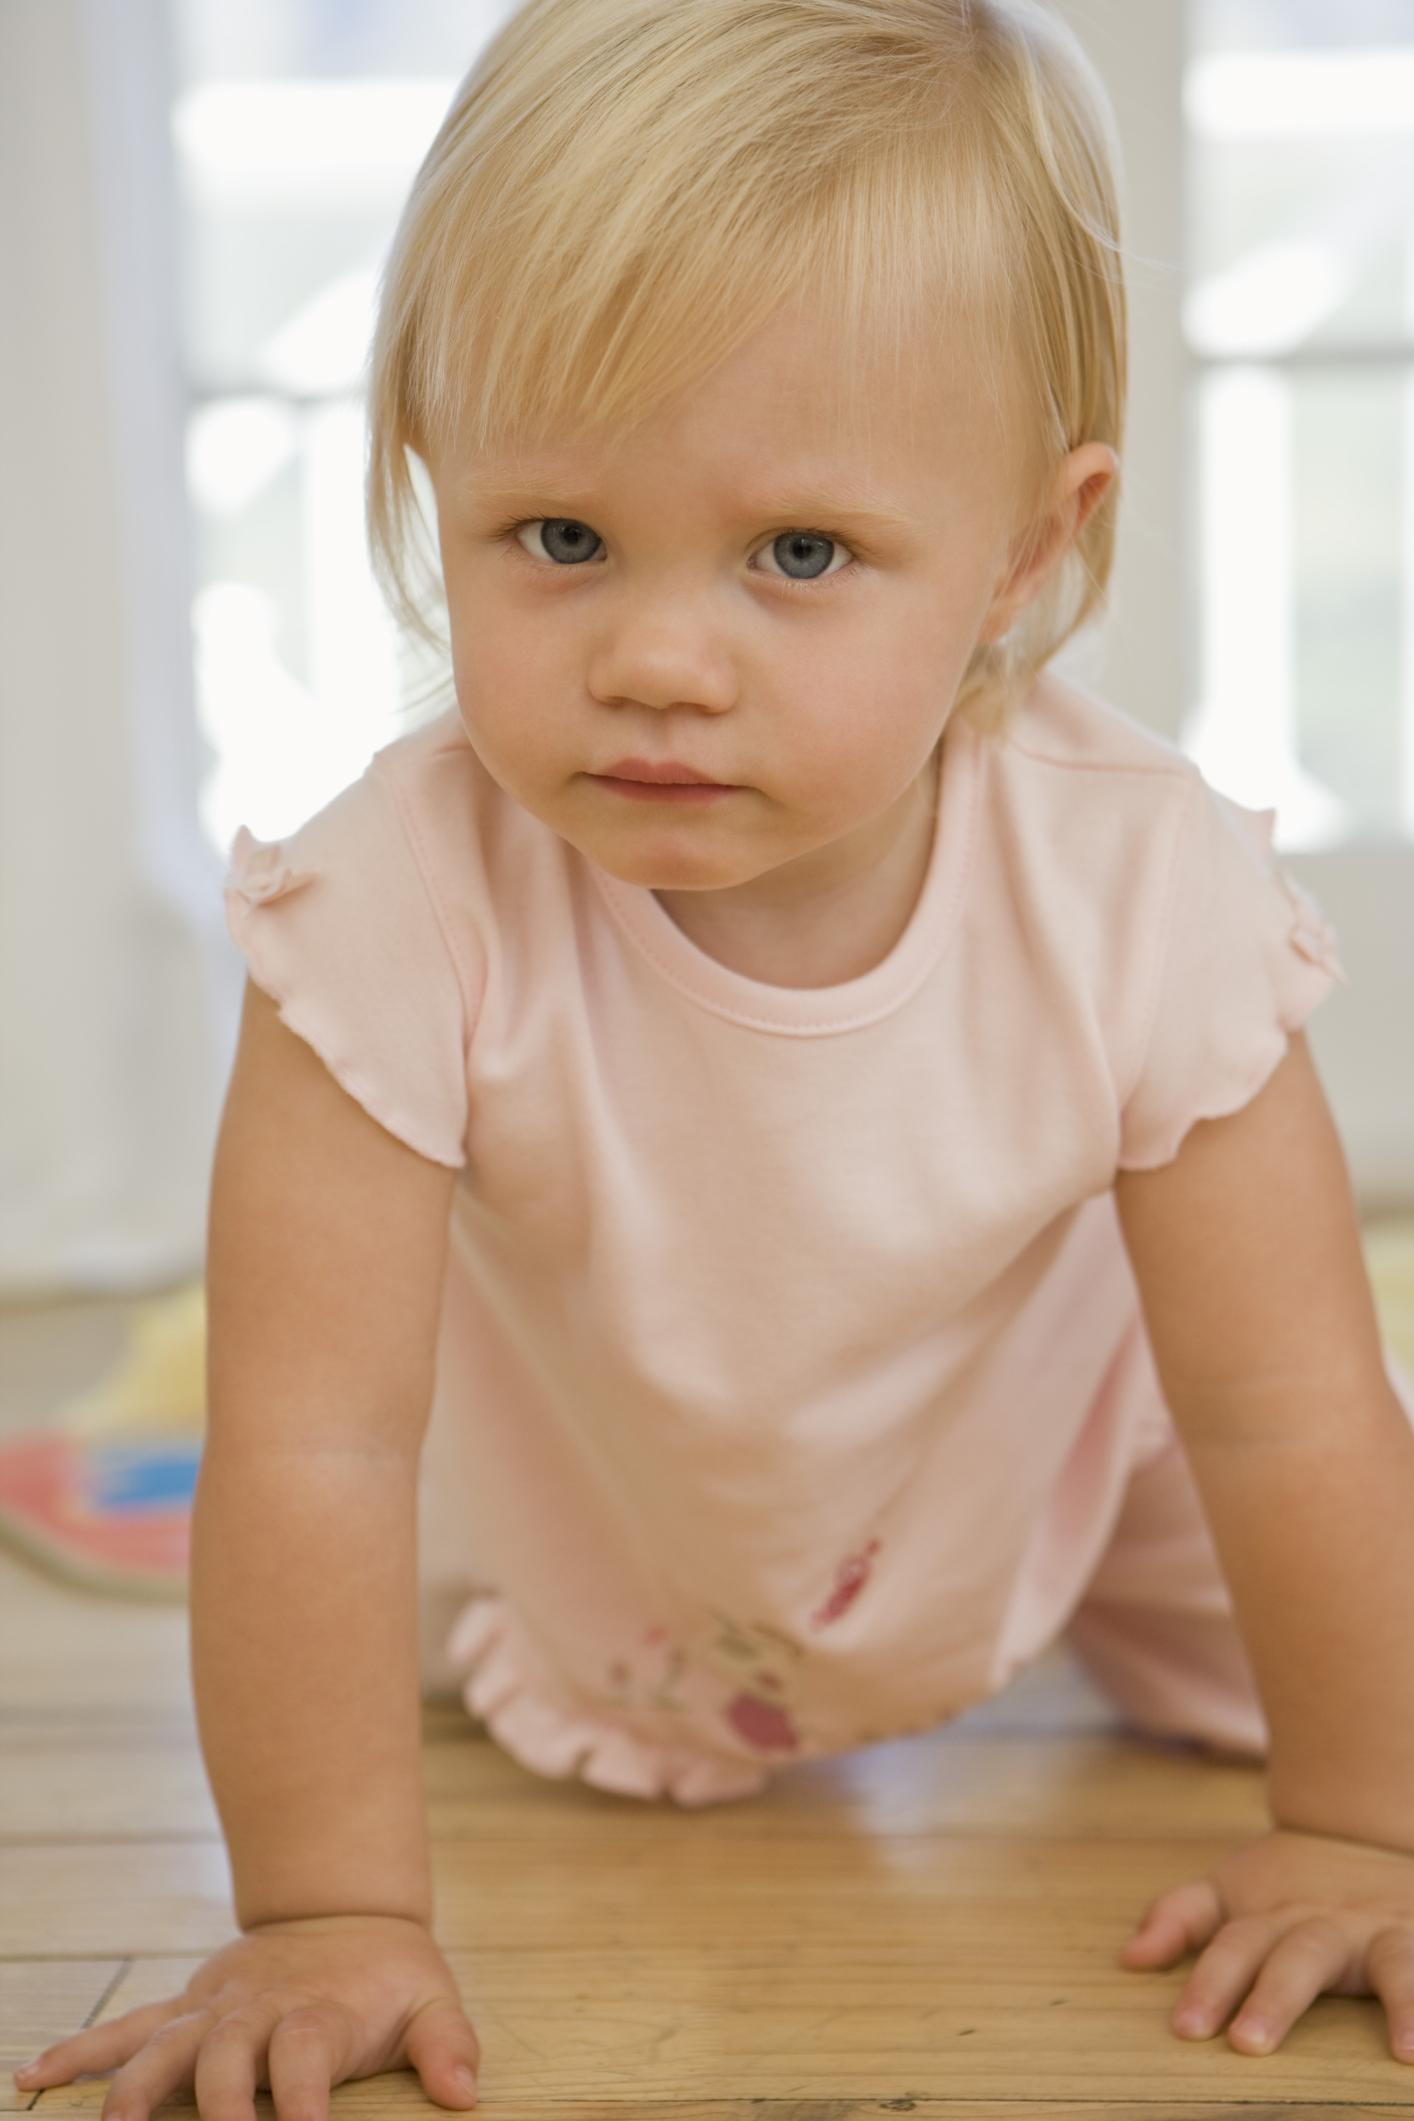 Fine motor gross motor activities for infants toddlers for Gross motor skills for infants and toddlers